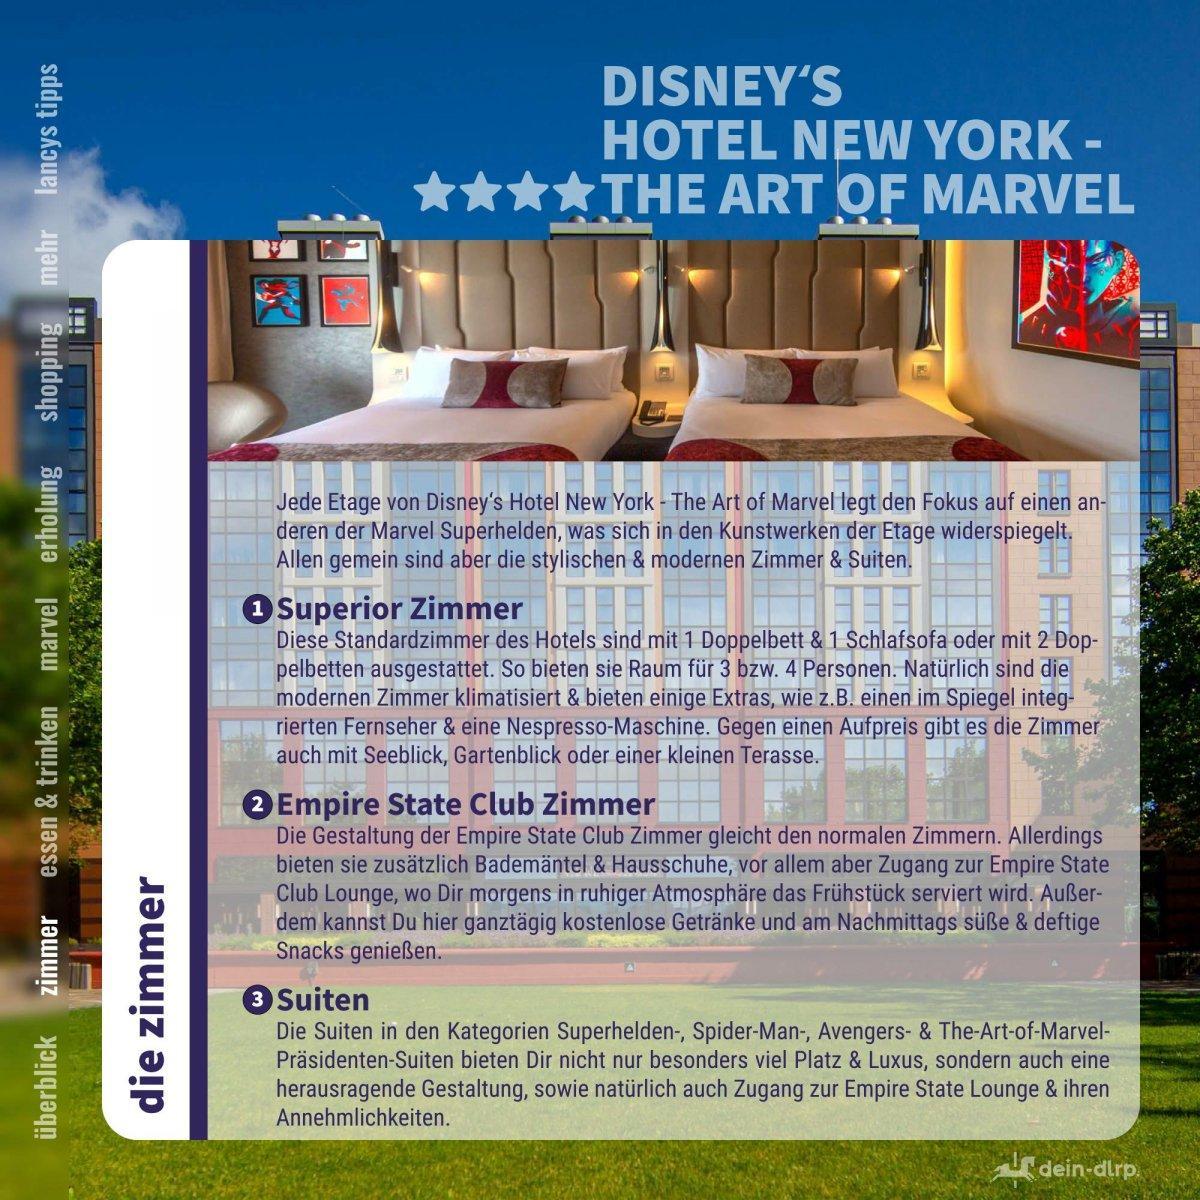 disneys-hotel-new-york-the-art-of-hotel-fuehrer_03.jpg